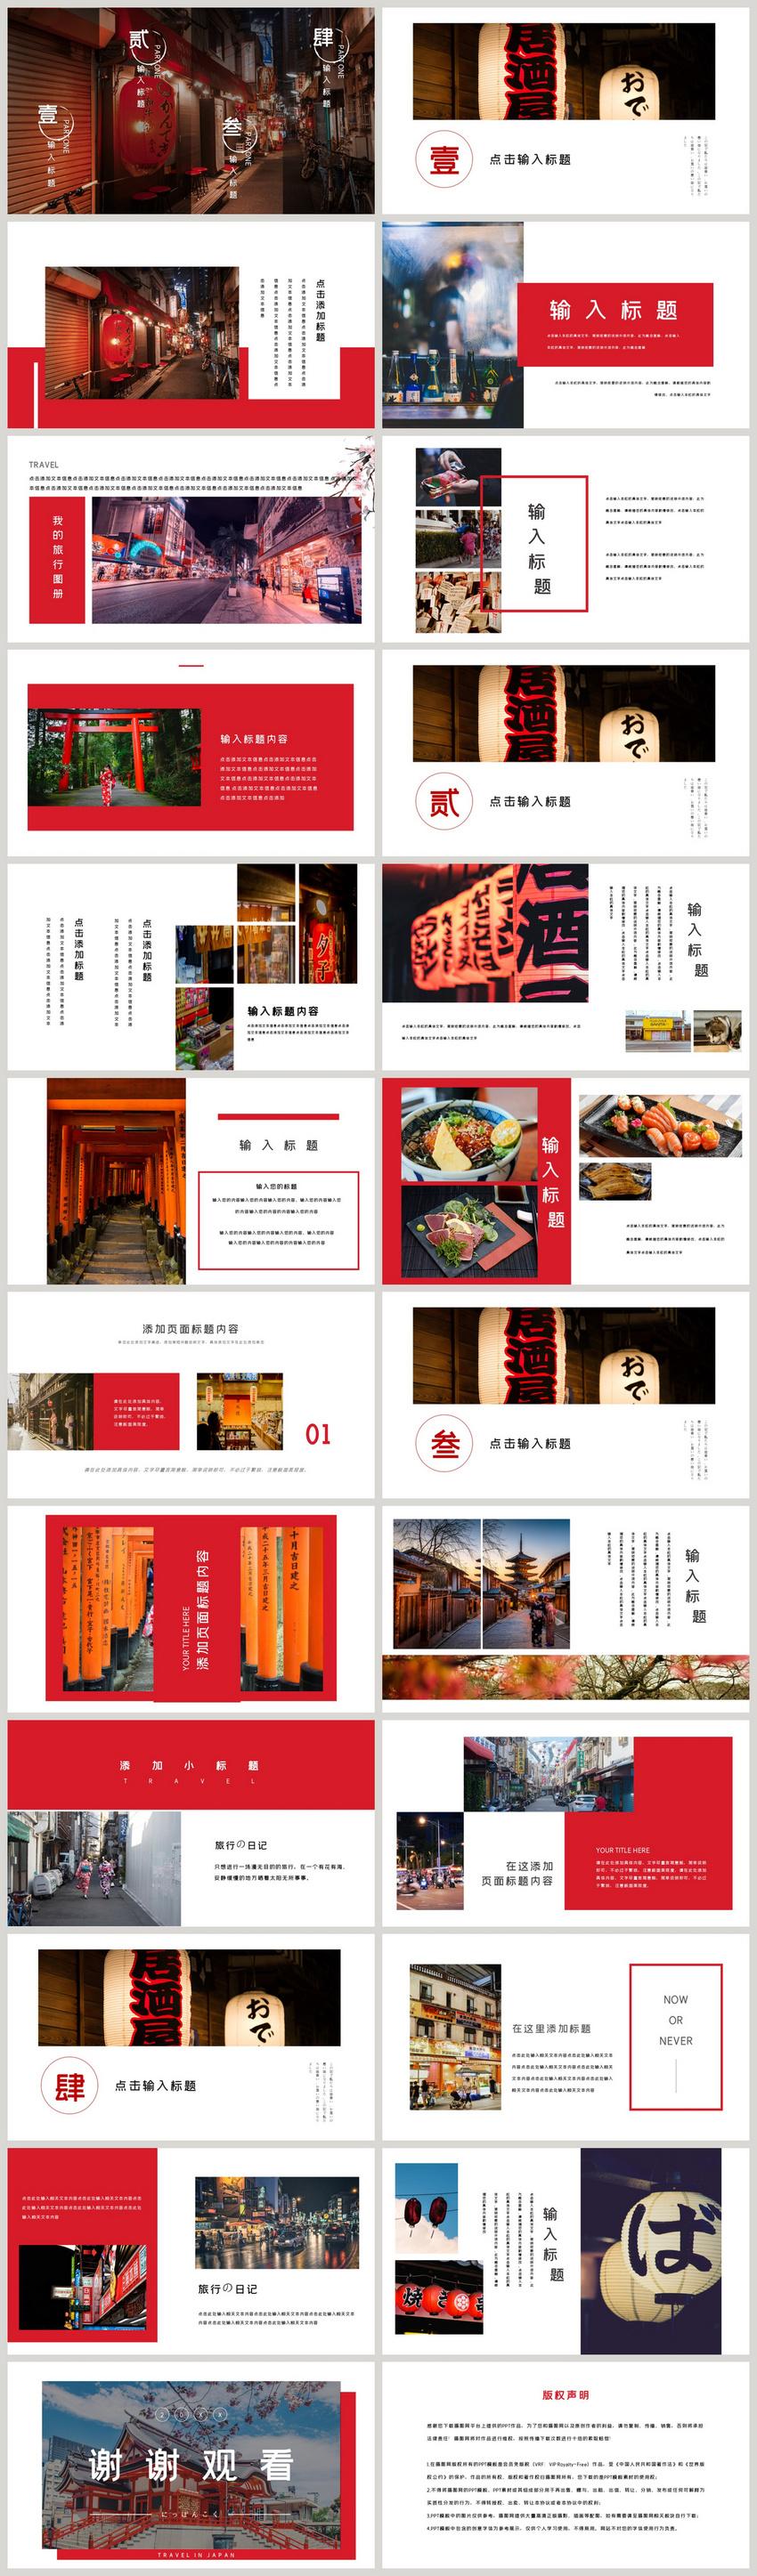 Japan Travel Photo Album Ppt Template Powerpoint Templete Ppt Free Download 401517925 Lovepik Com